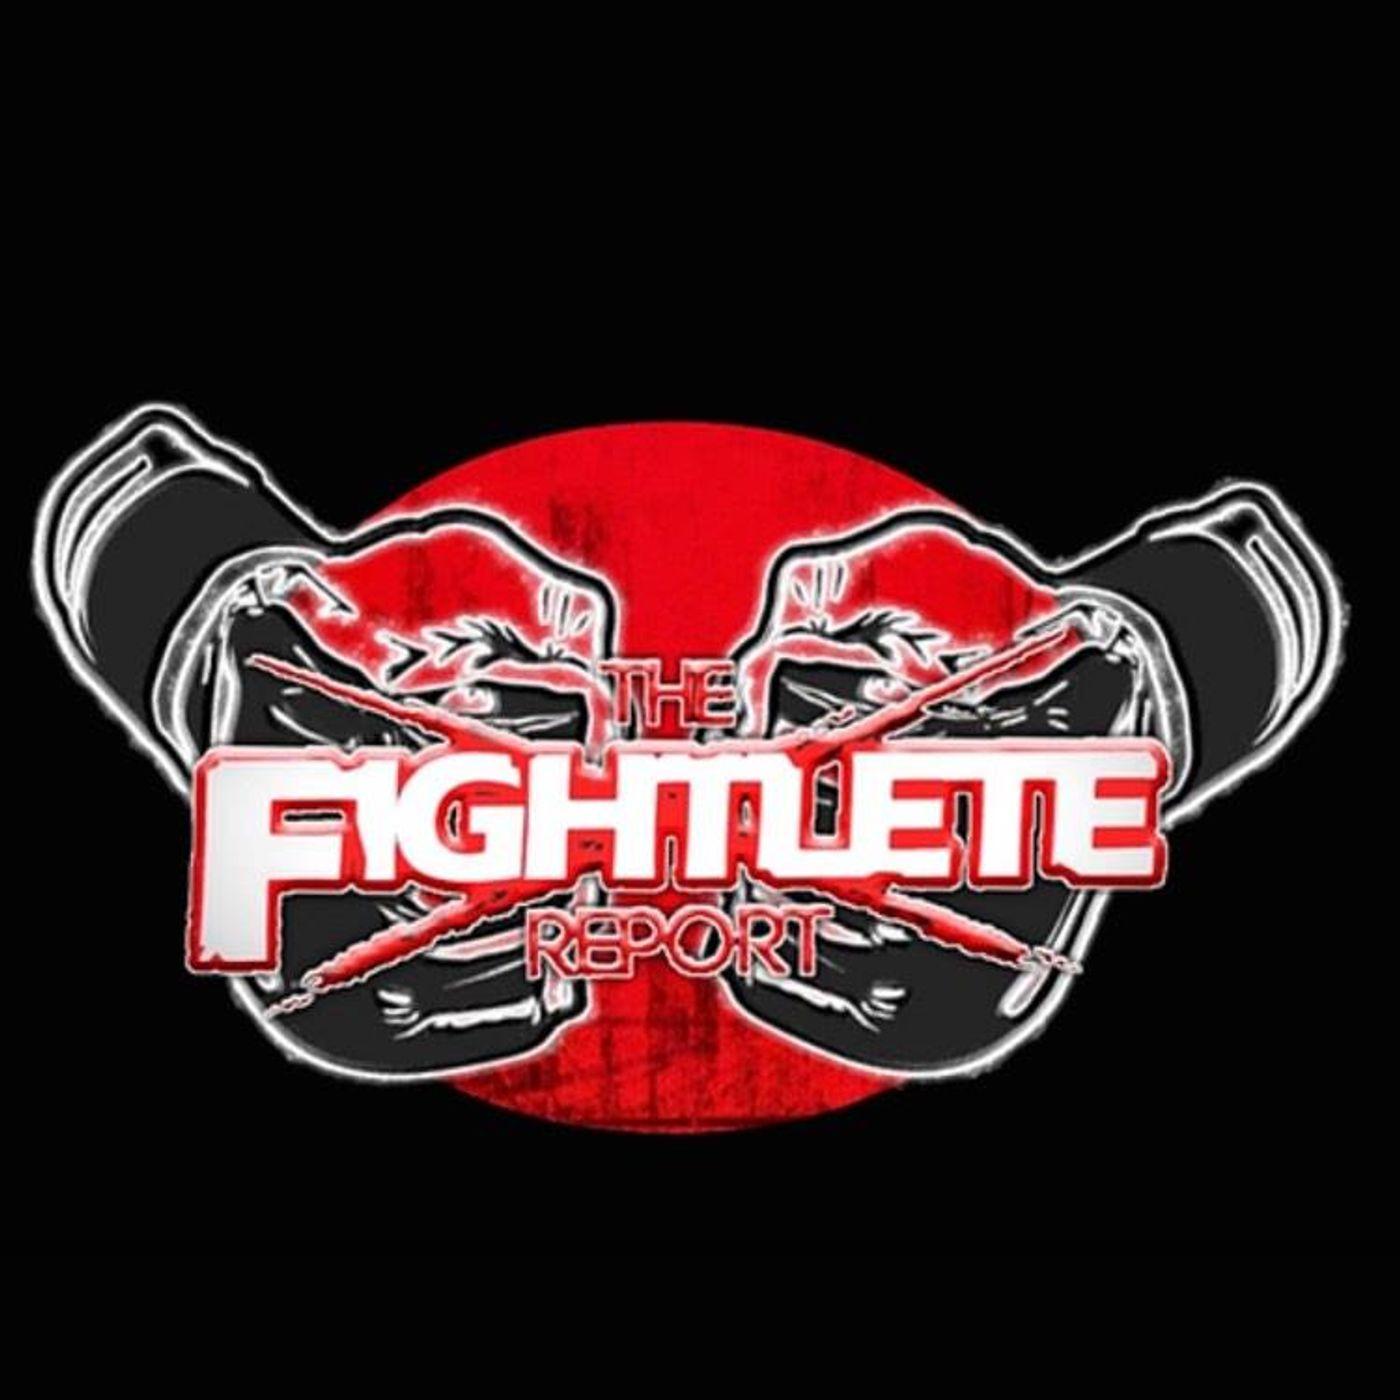 Fightlete Report Interview with Pura Vida MMA's Zak Ottow coach of UFC Bantamweight Montel Jackson